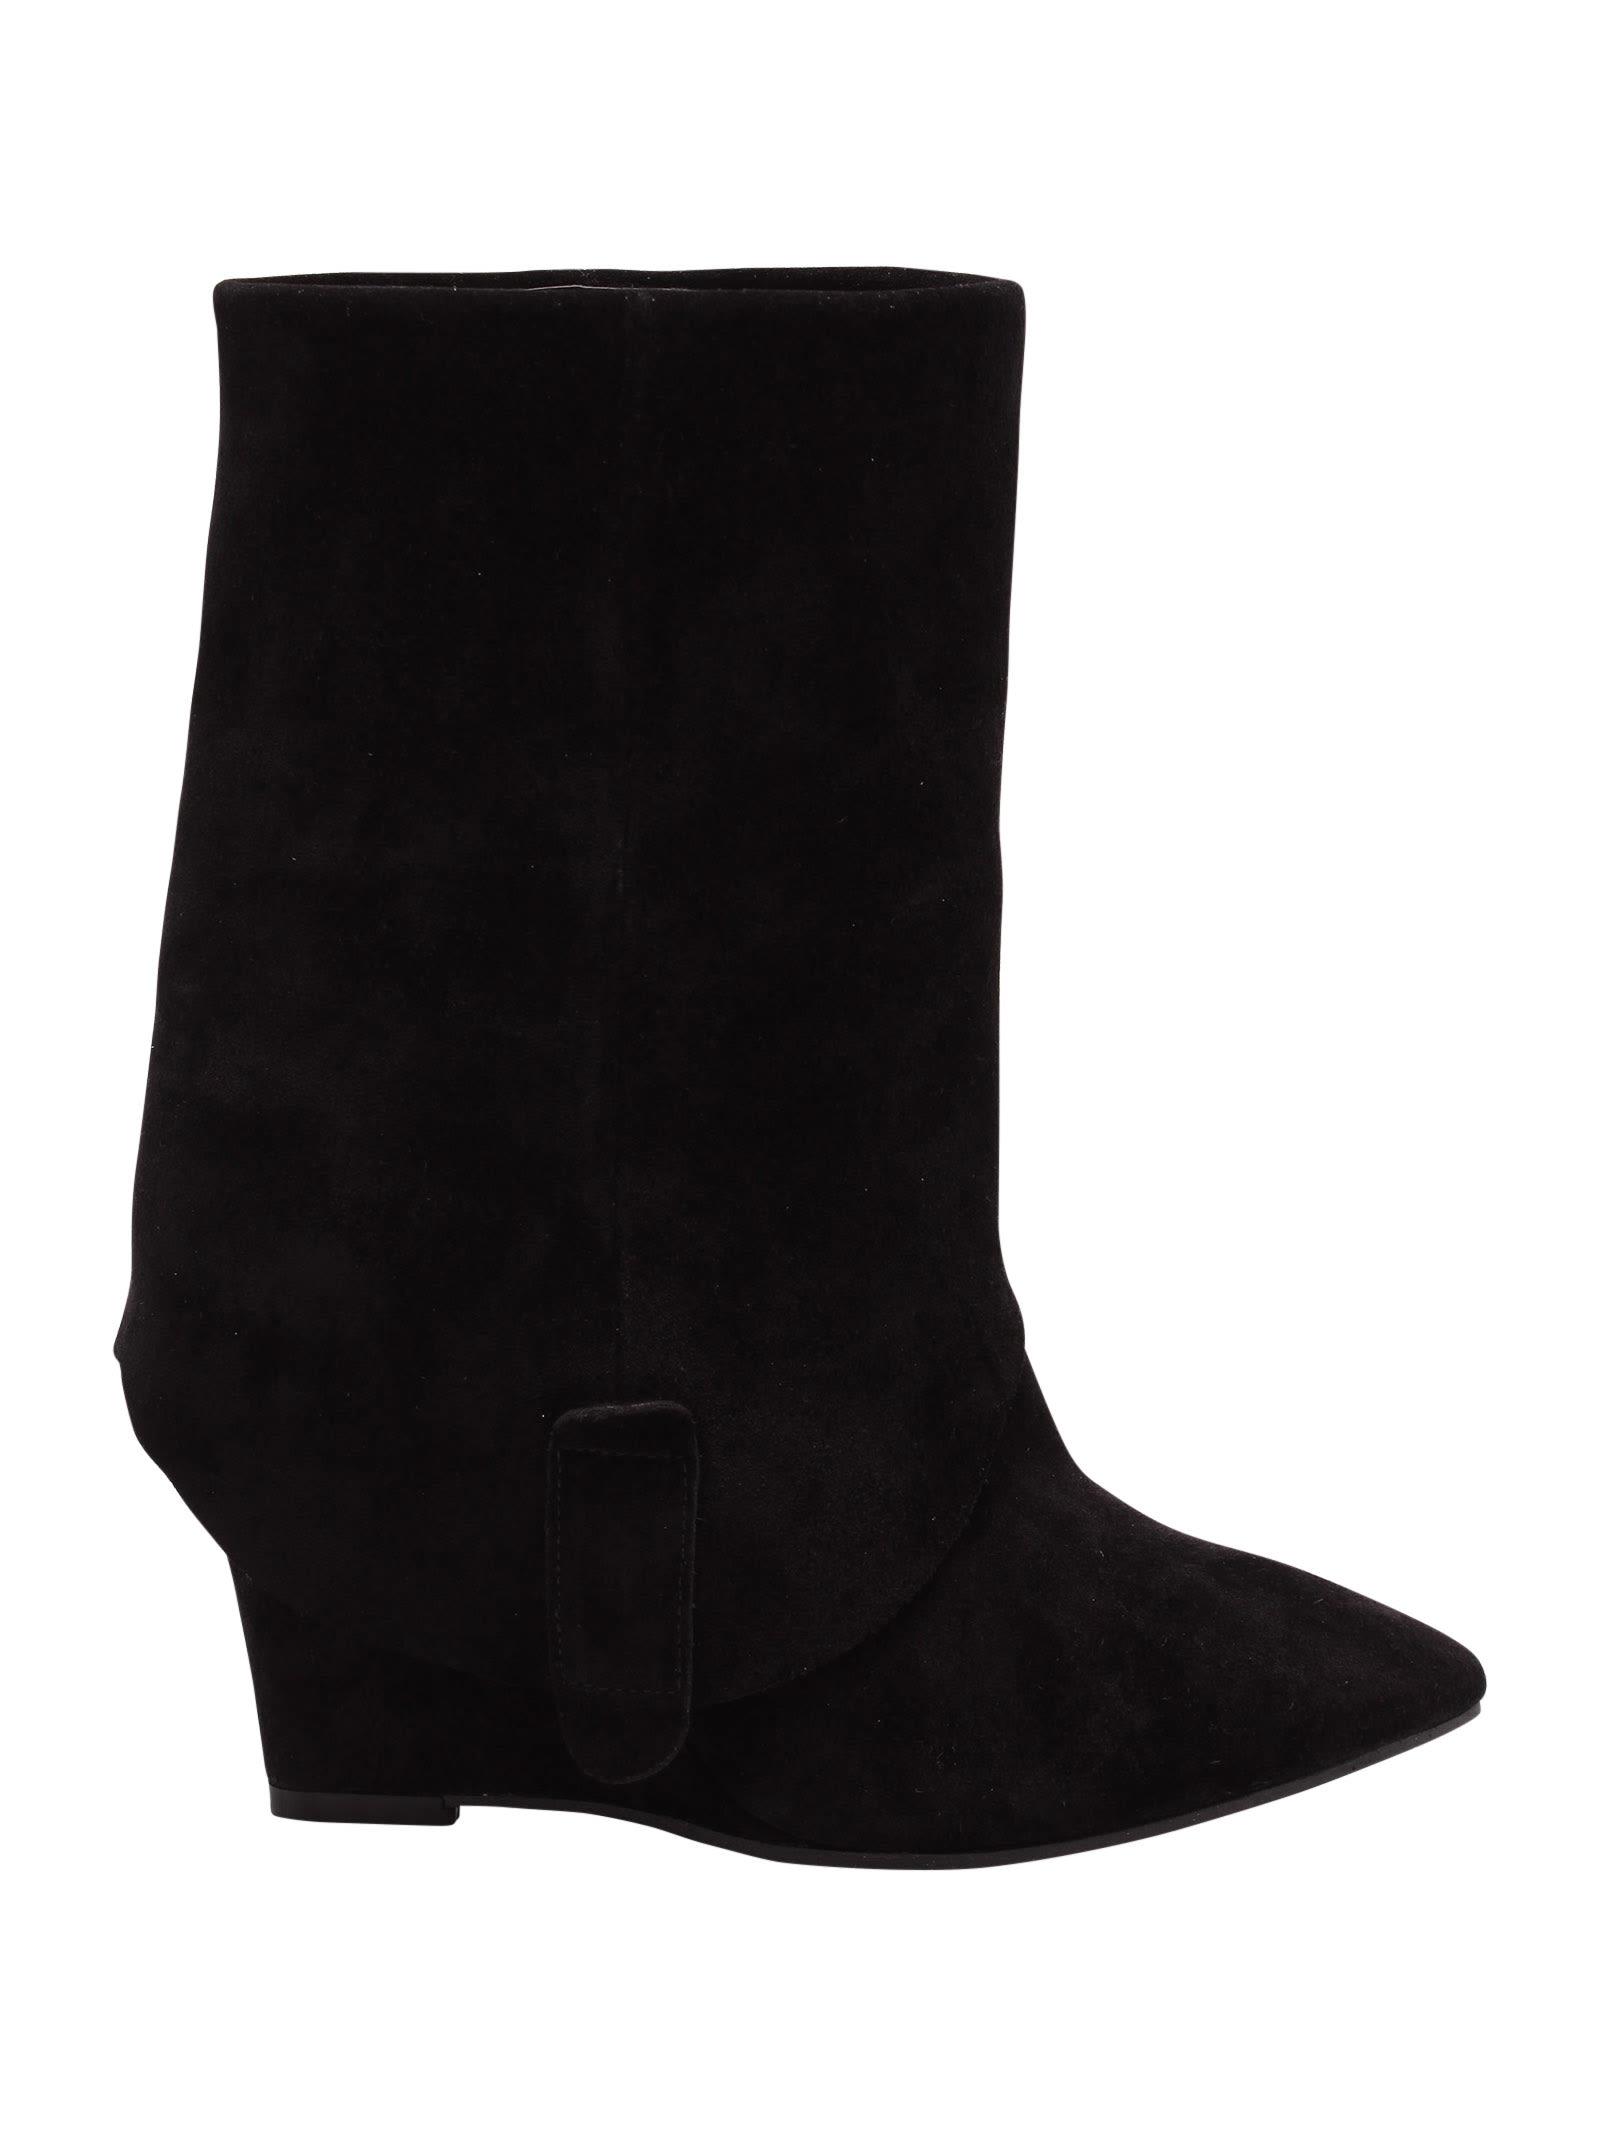 maga Leather Boots